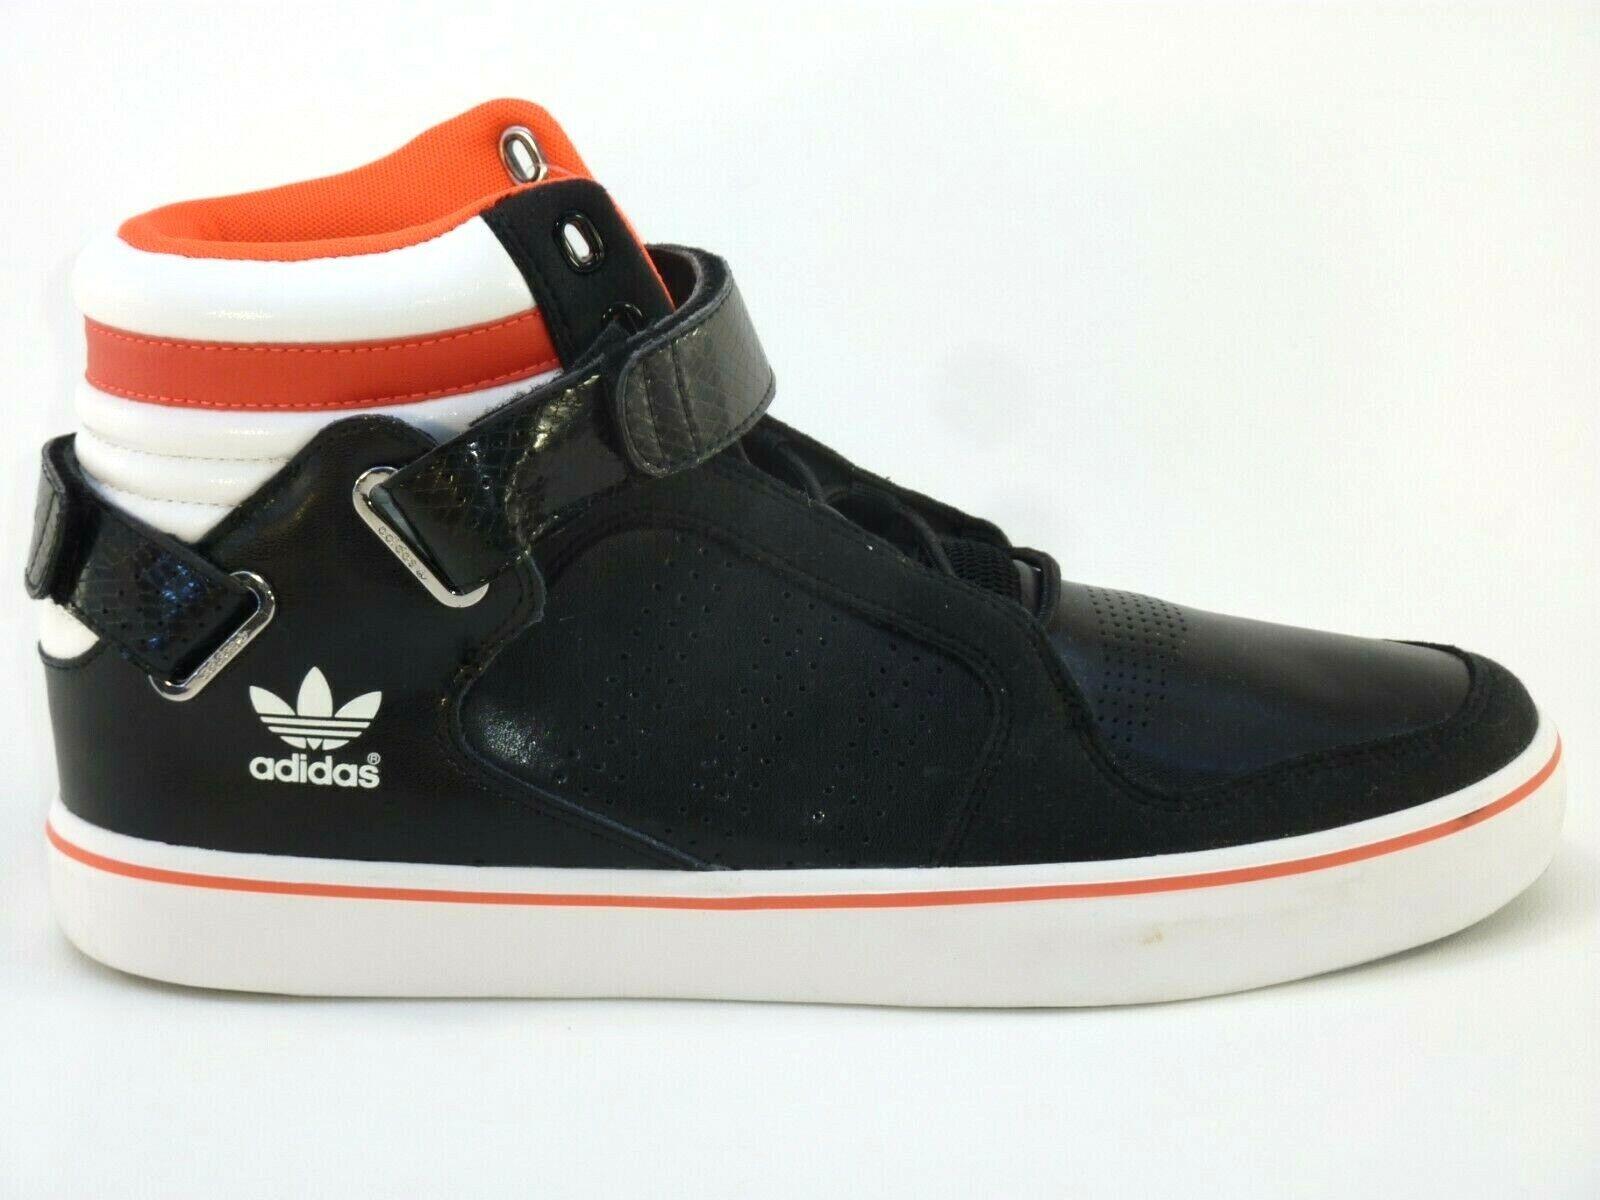 Tareas del hogar Abundante barrera  Adidas Originals Adi Rise Mid Size 10 for sale online | eBay